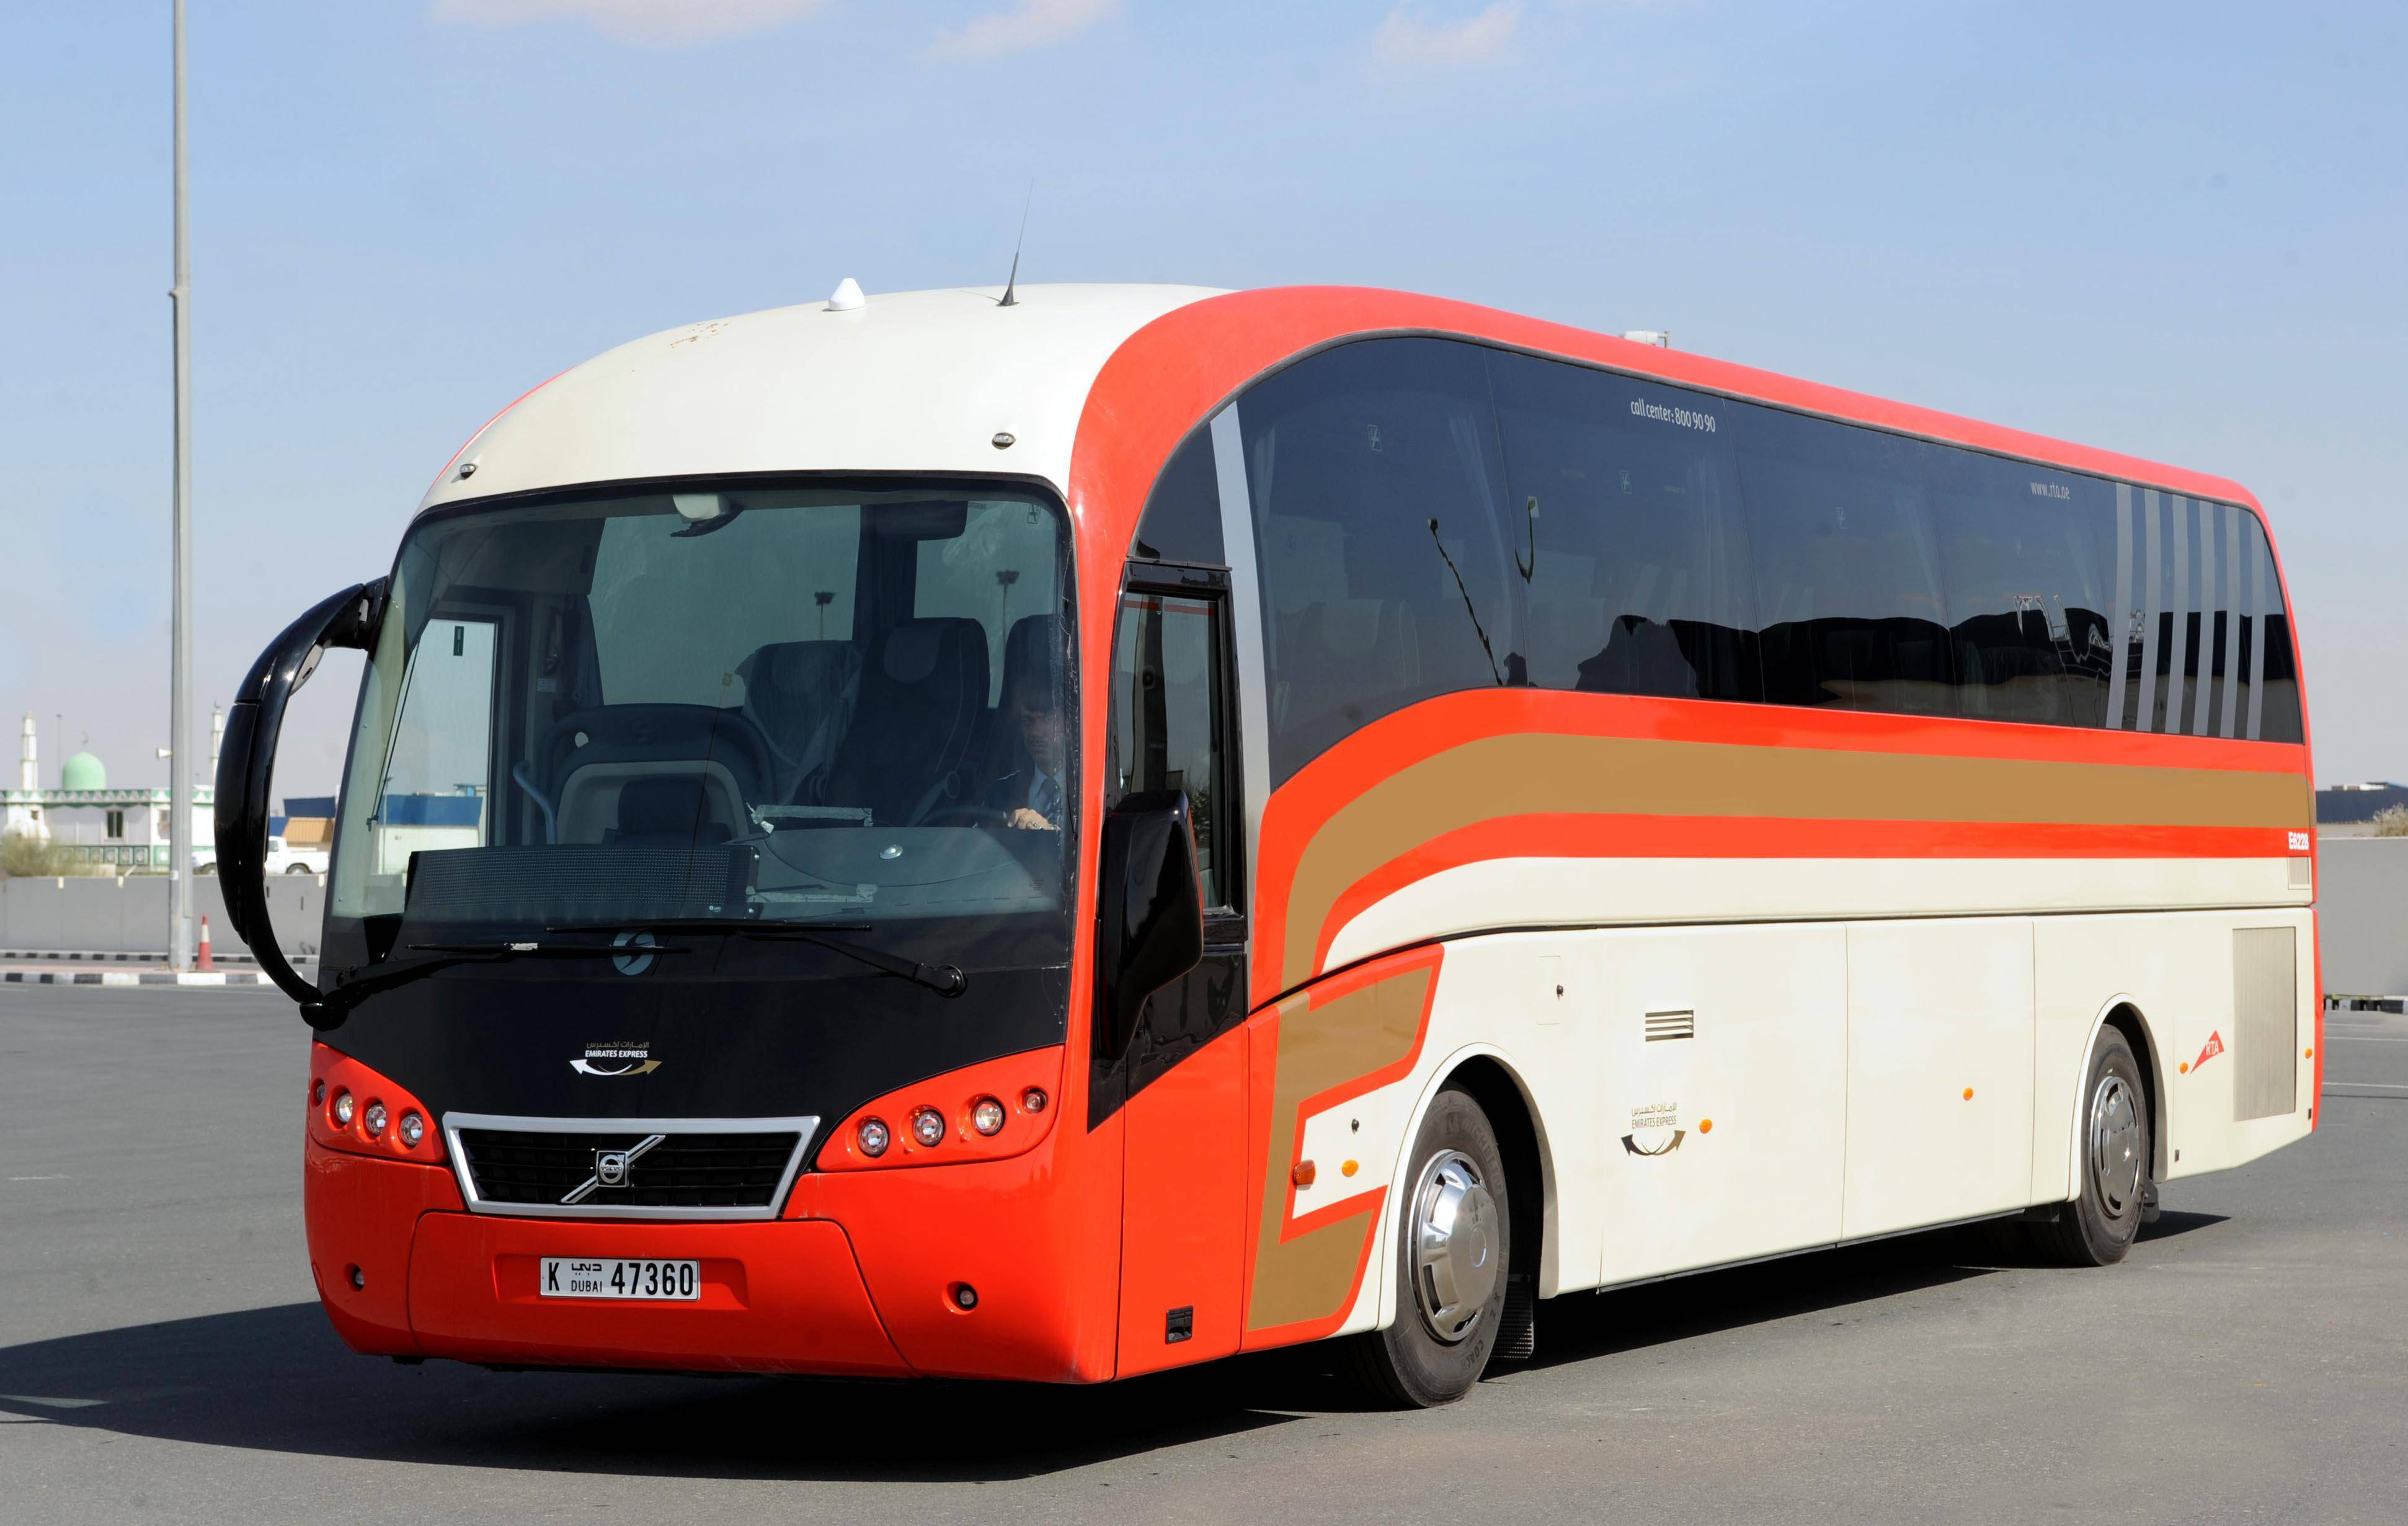 New bus route, bus lanes for Dubai-Sharjah routes launched